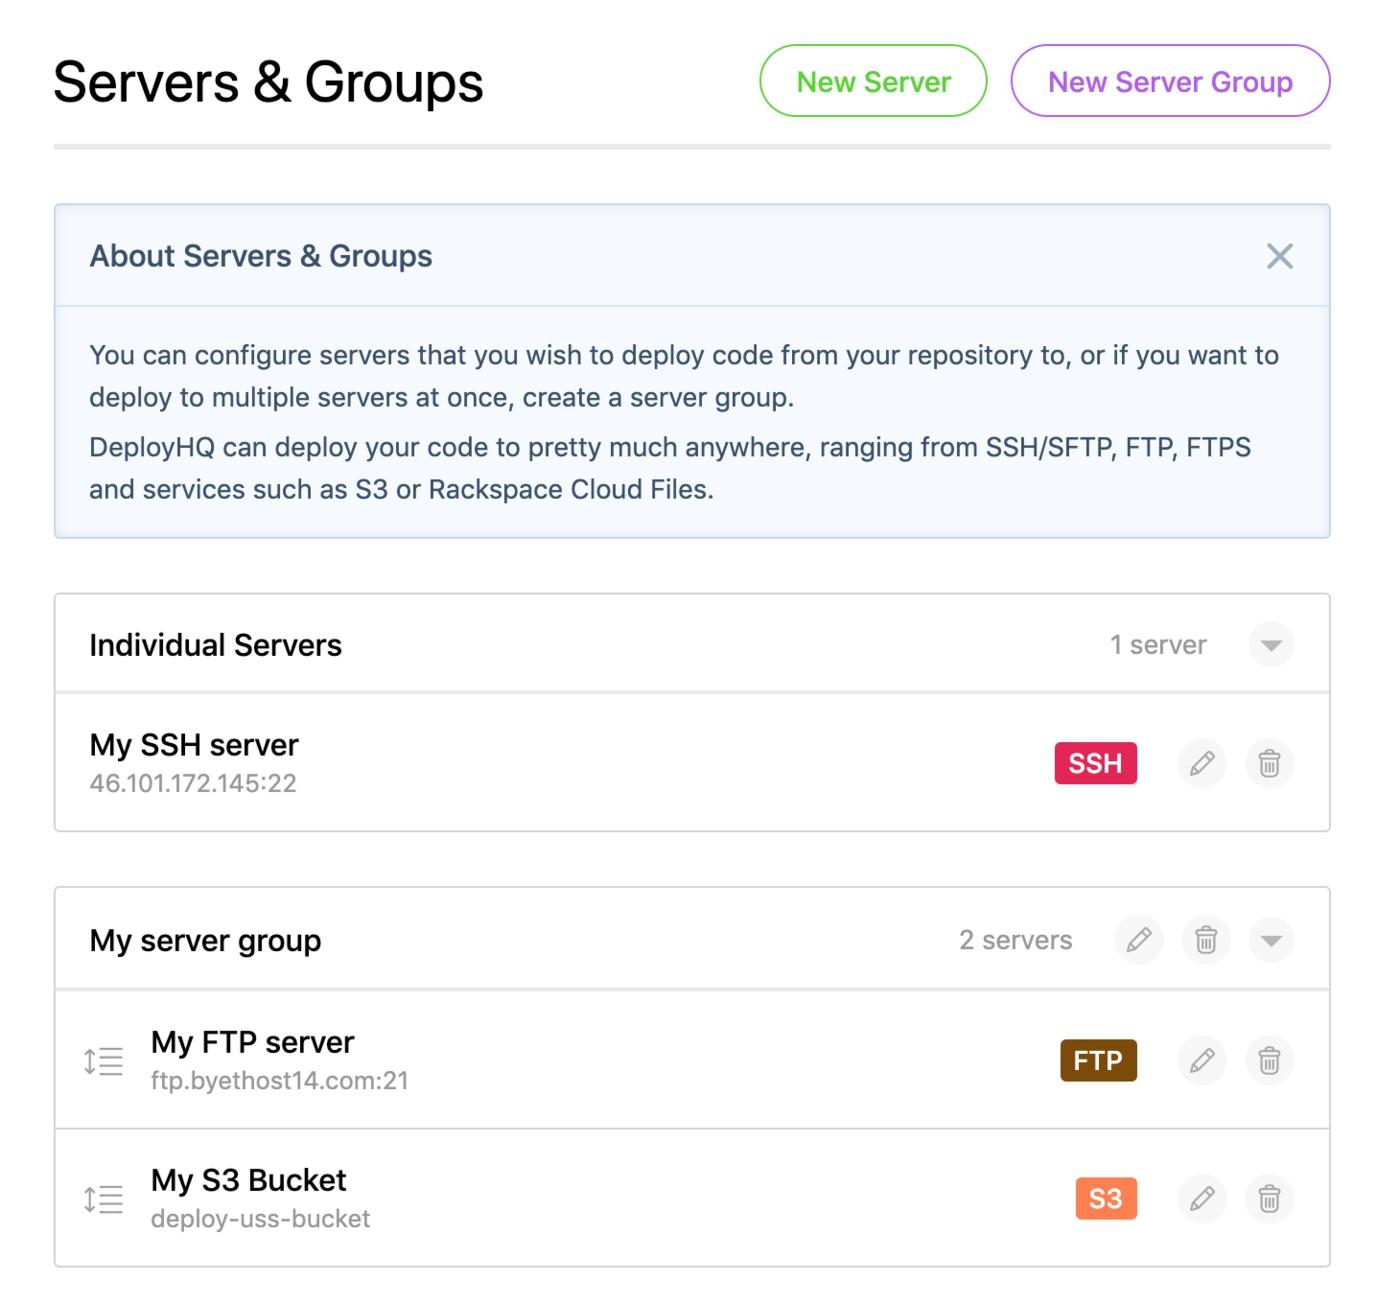 Server Groups list